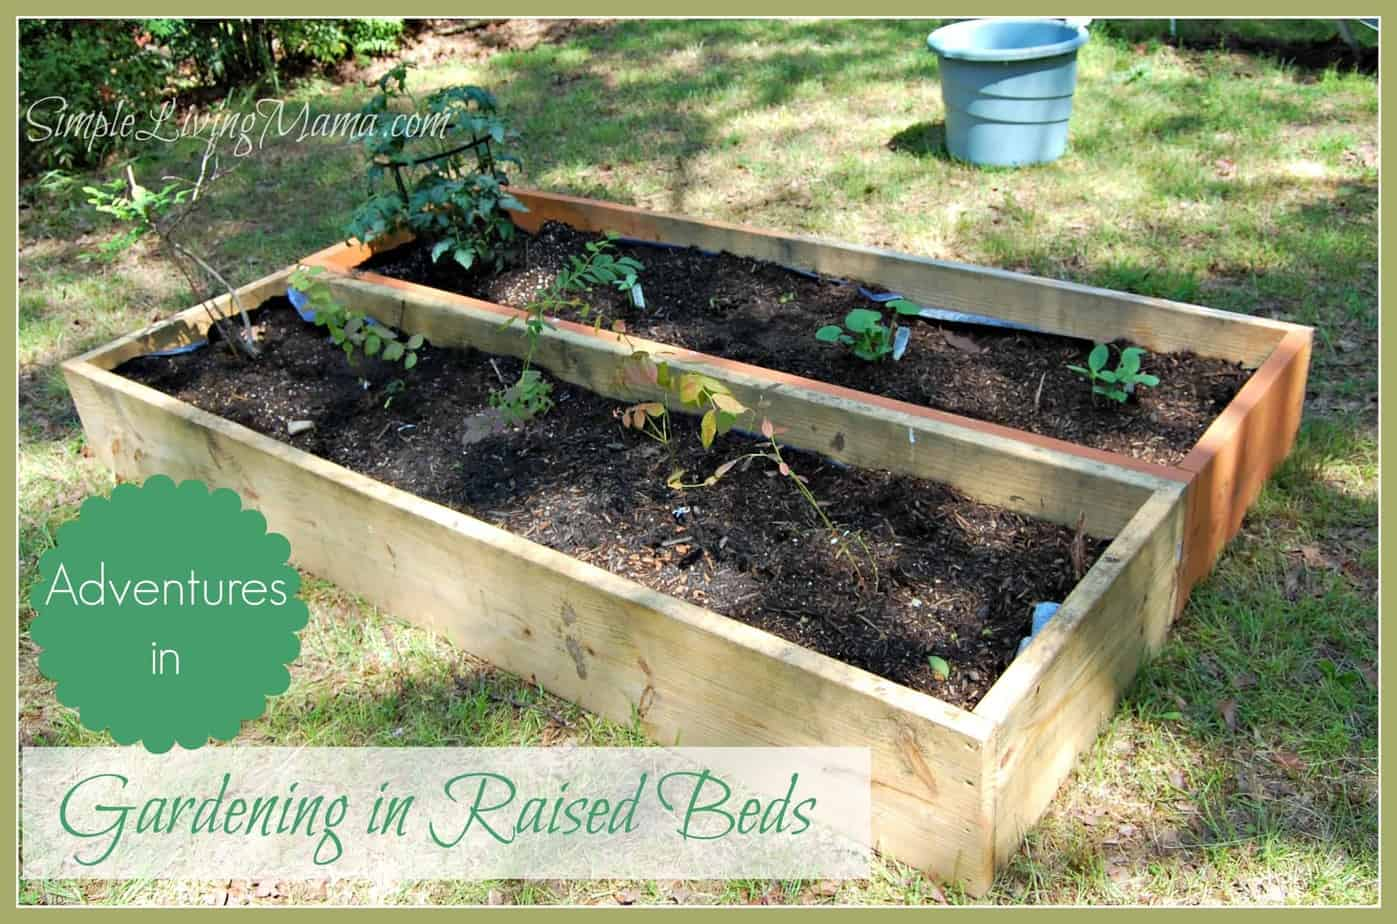 Gardening In Raised Beds